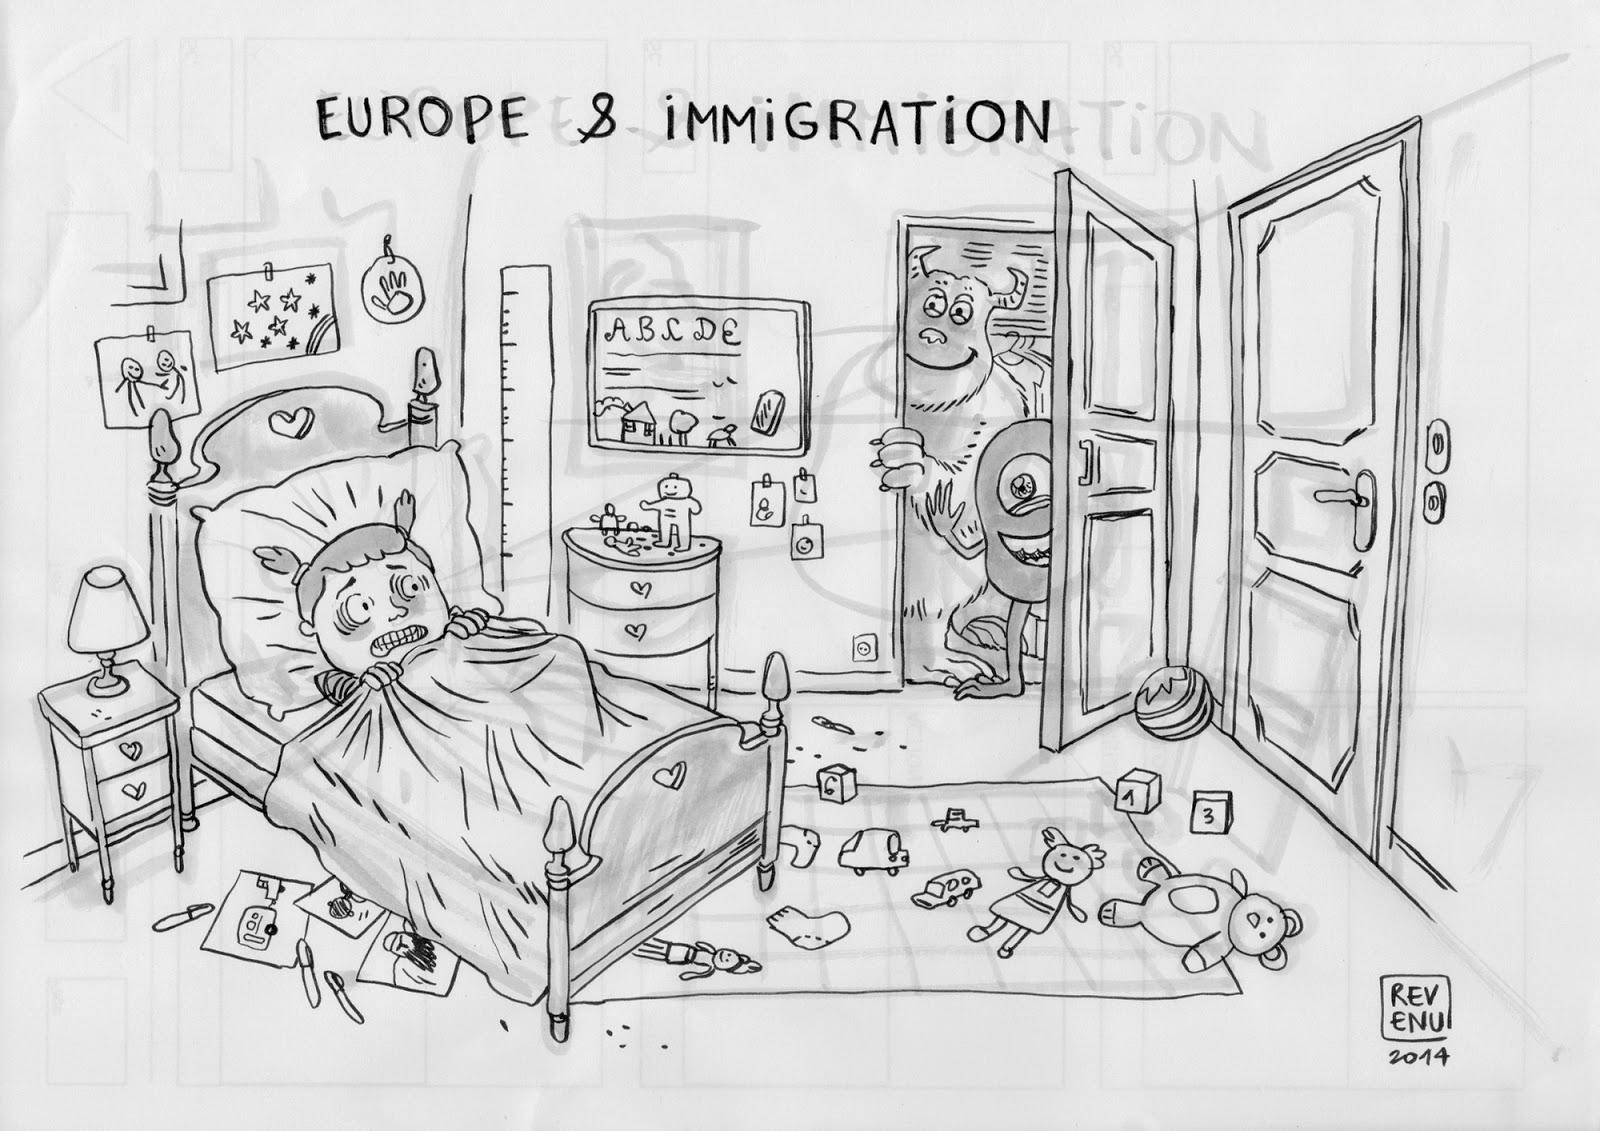 http://www.dessindart.fr/